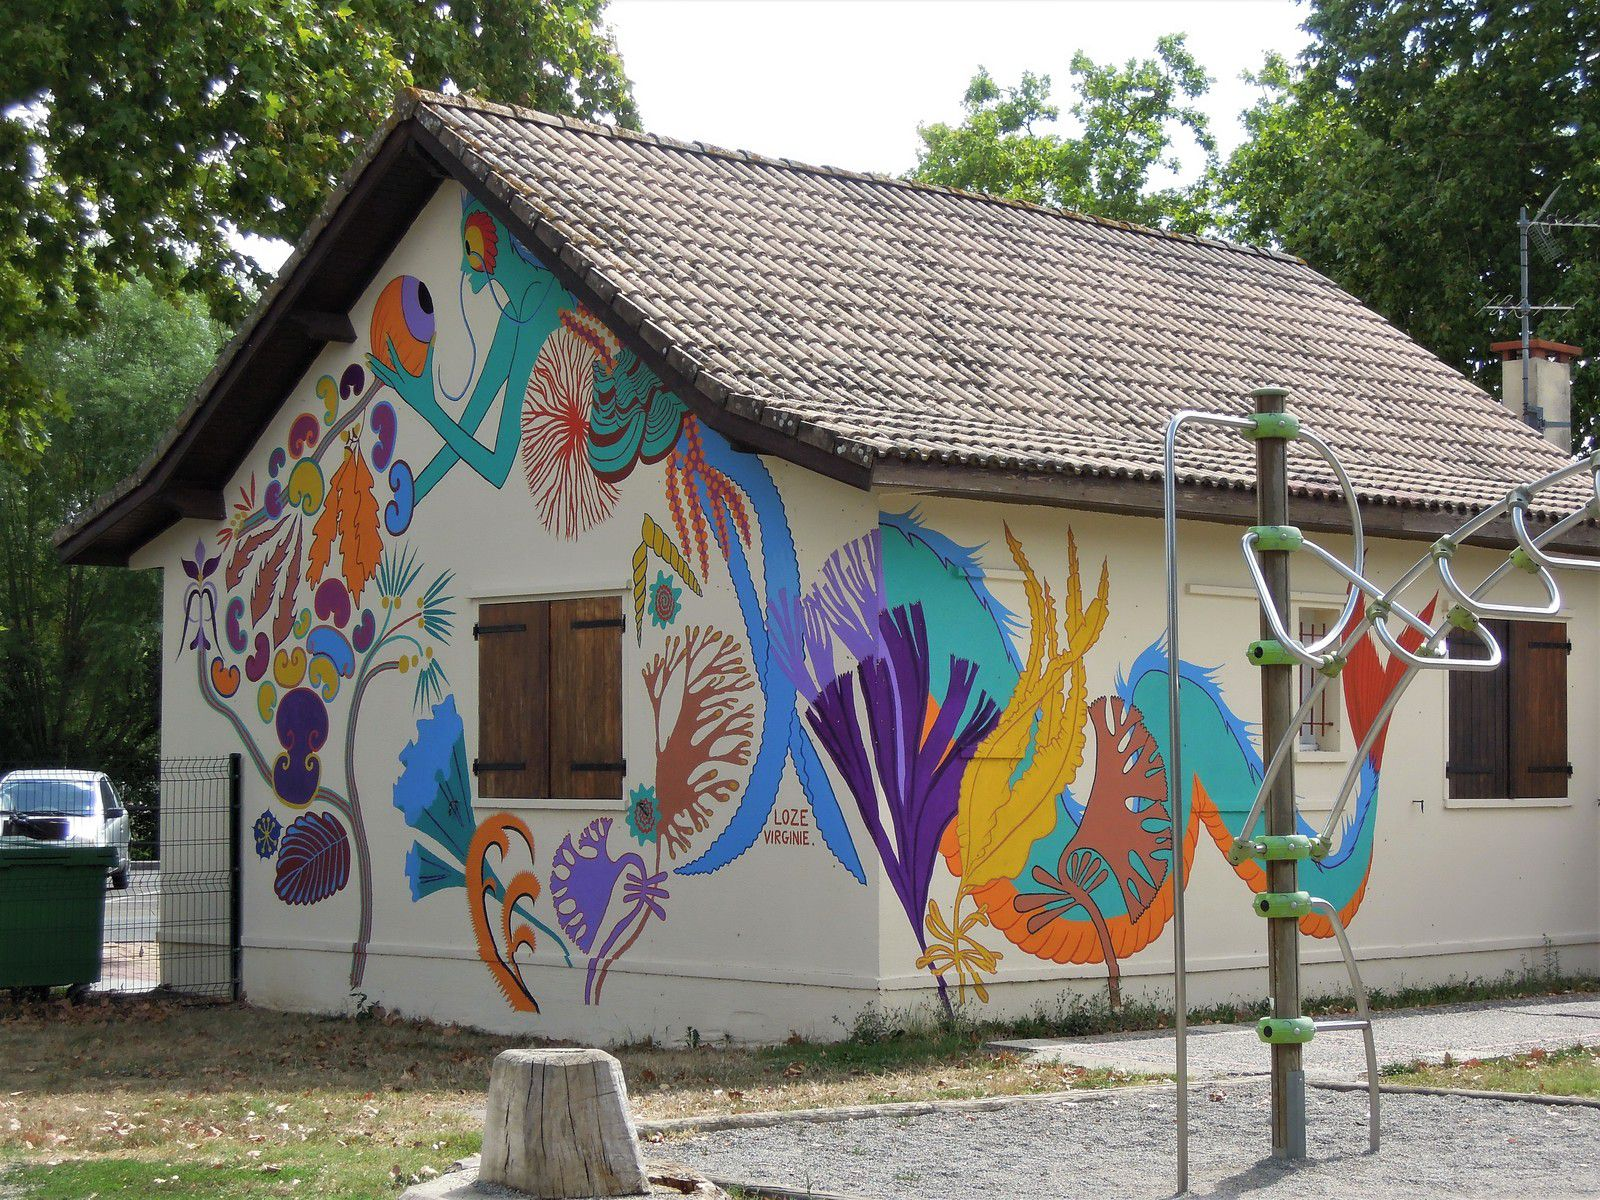 Street art @ Le gers